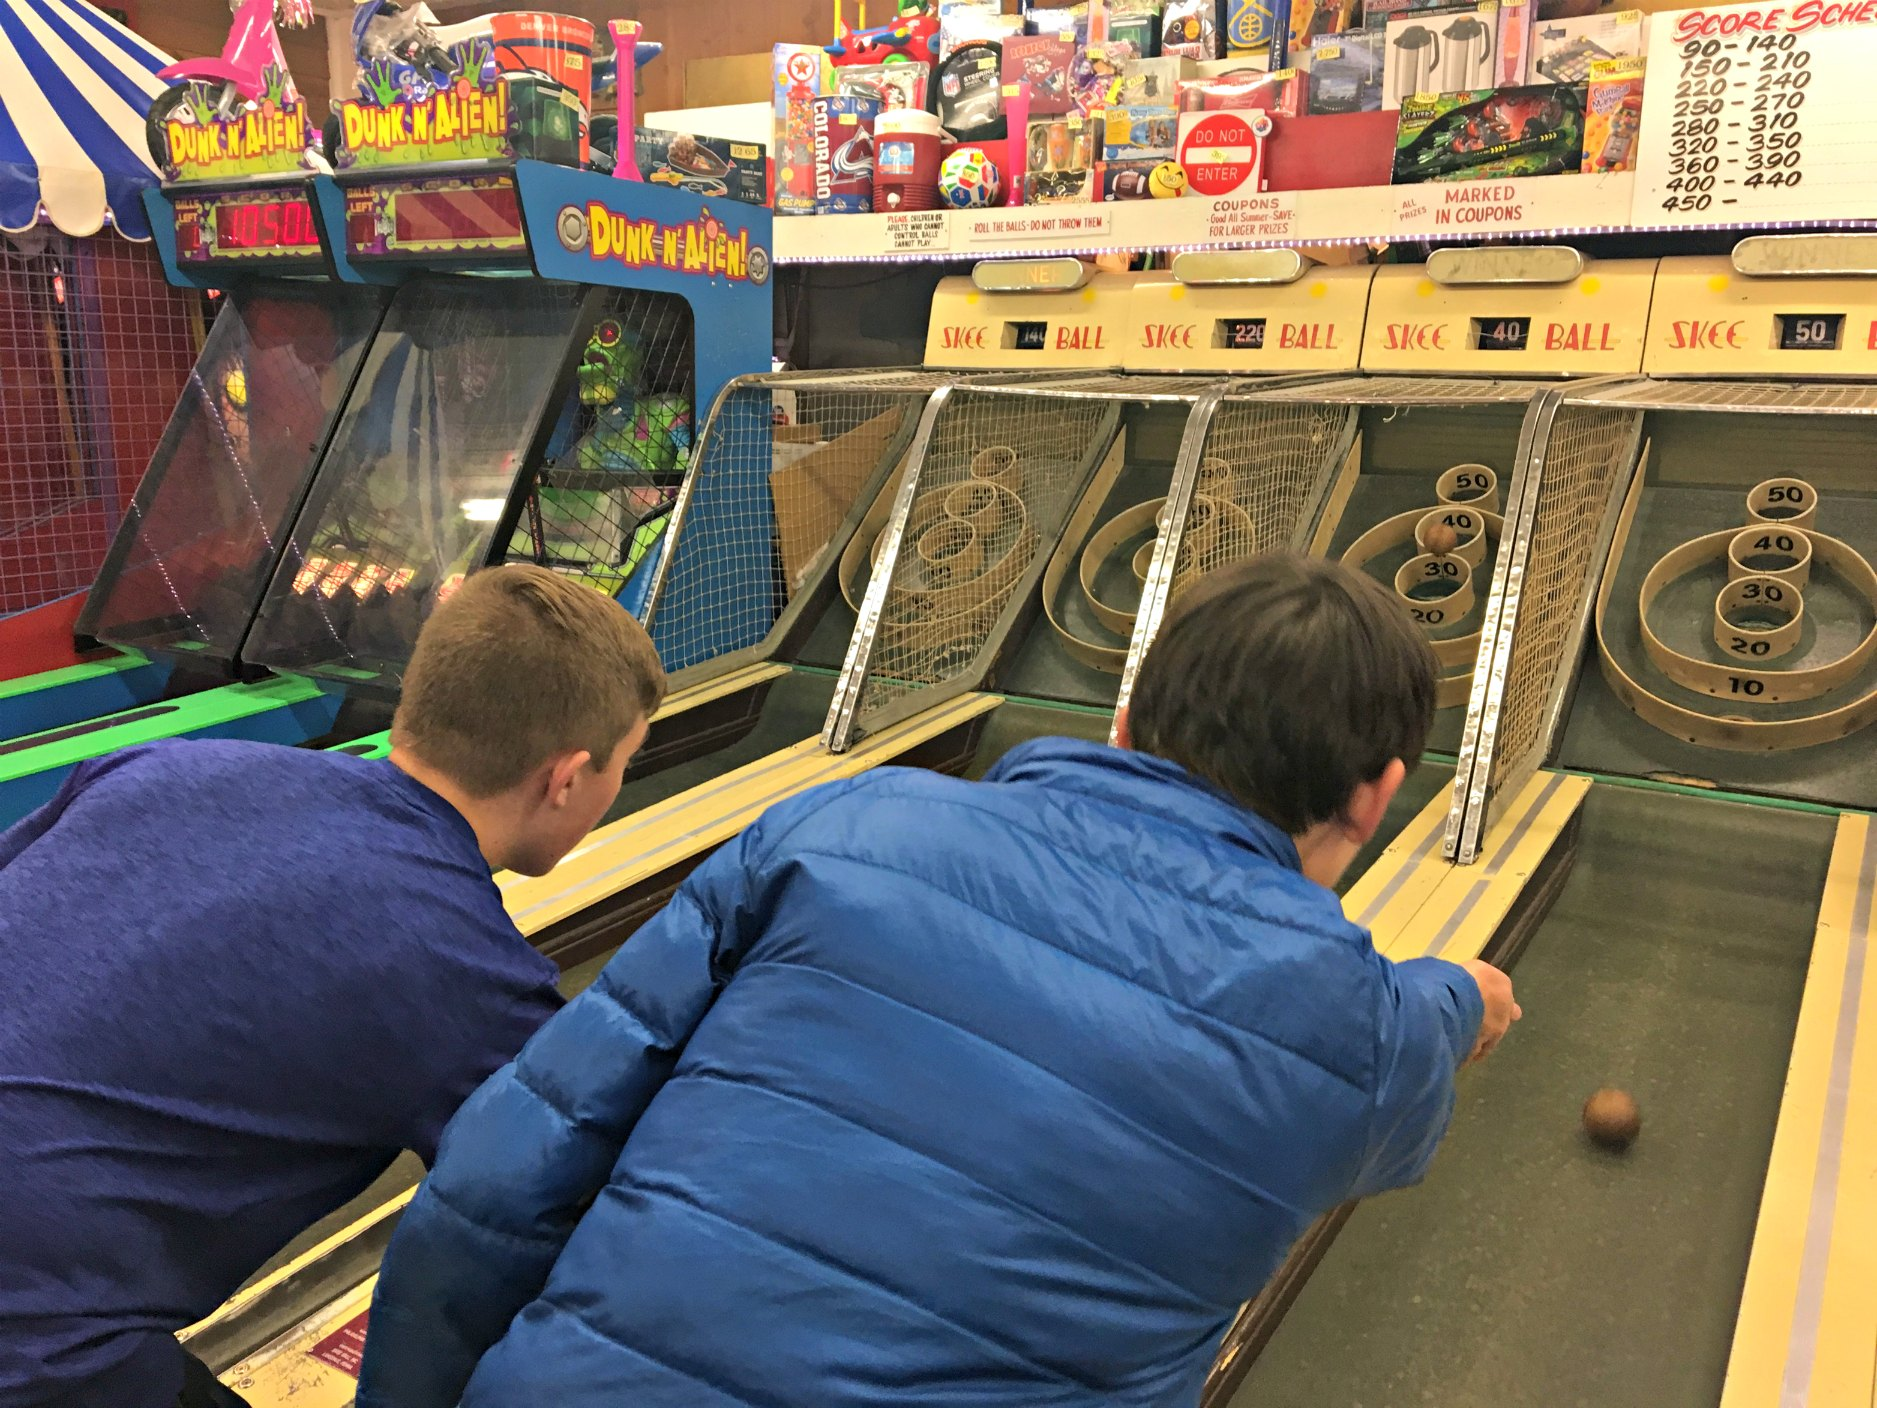 manitou-springs-penny-arcade